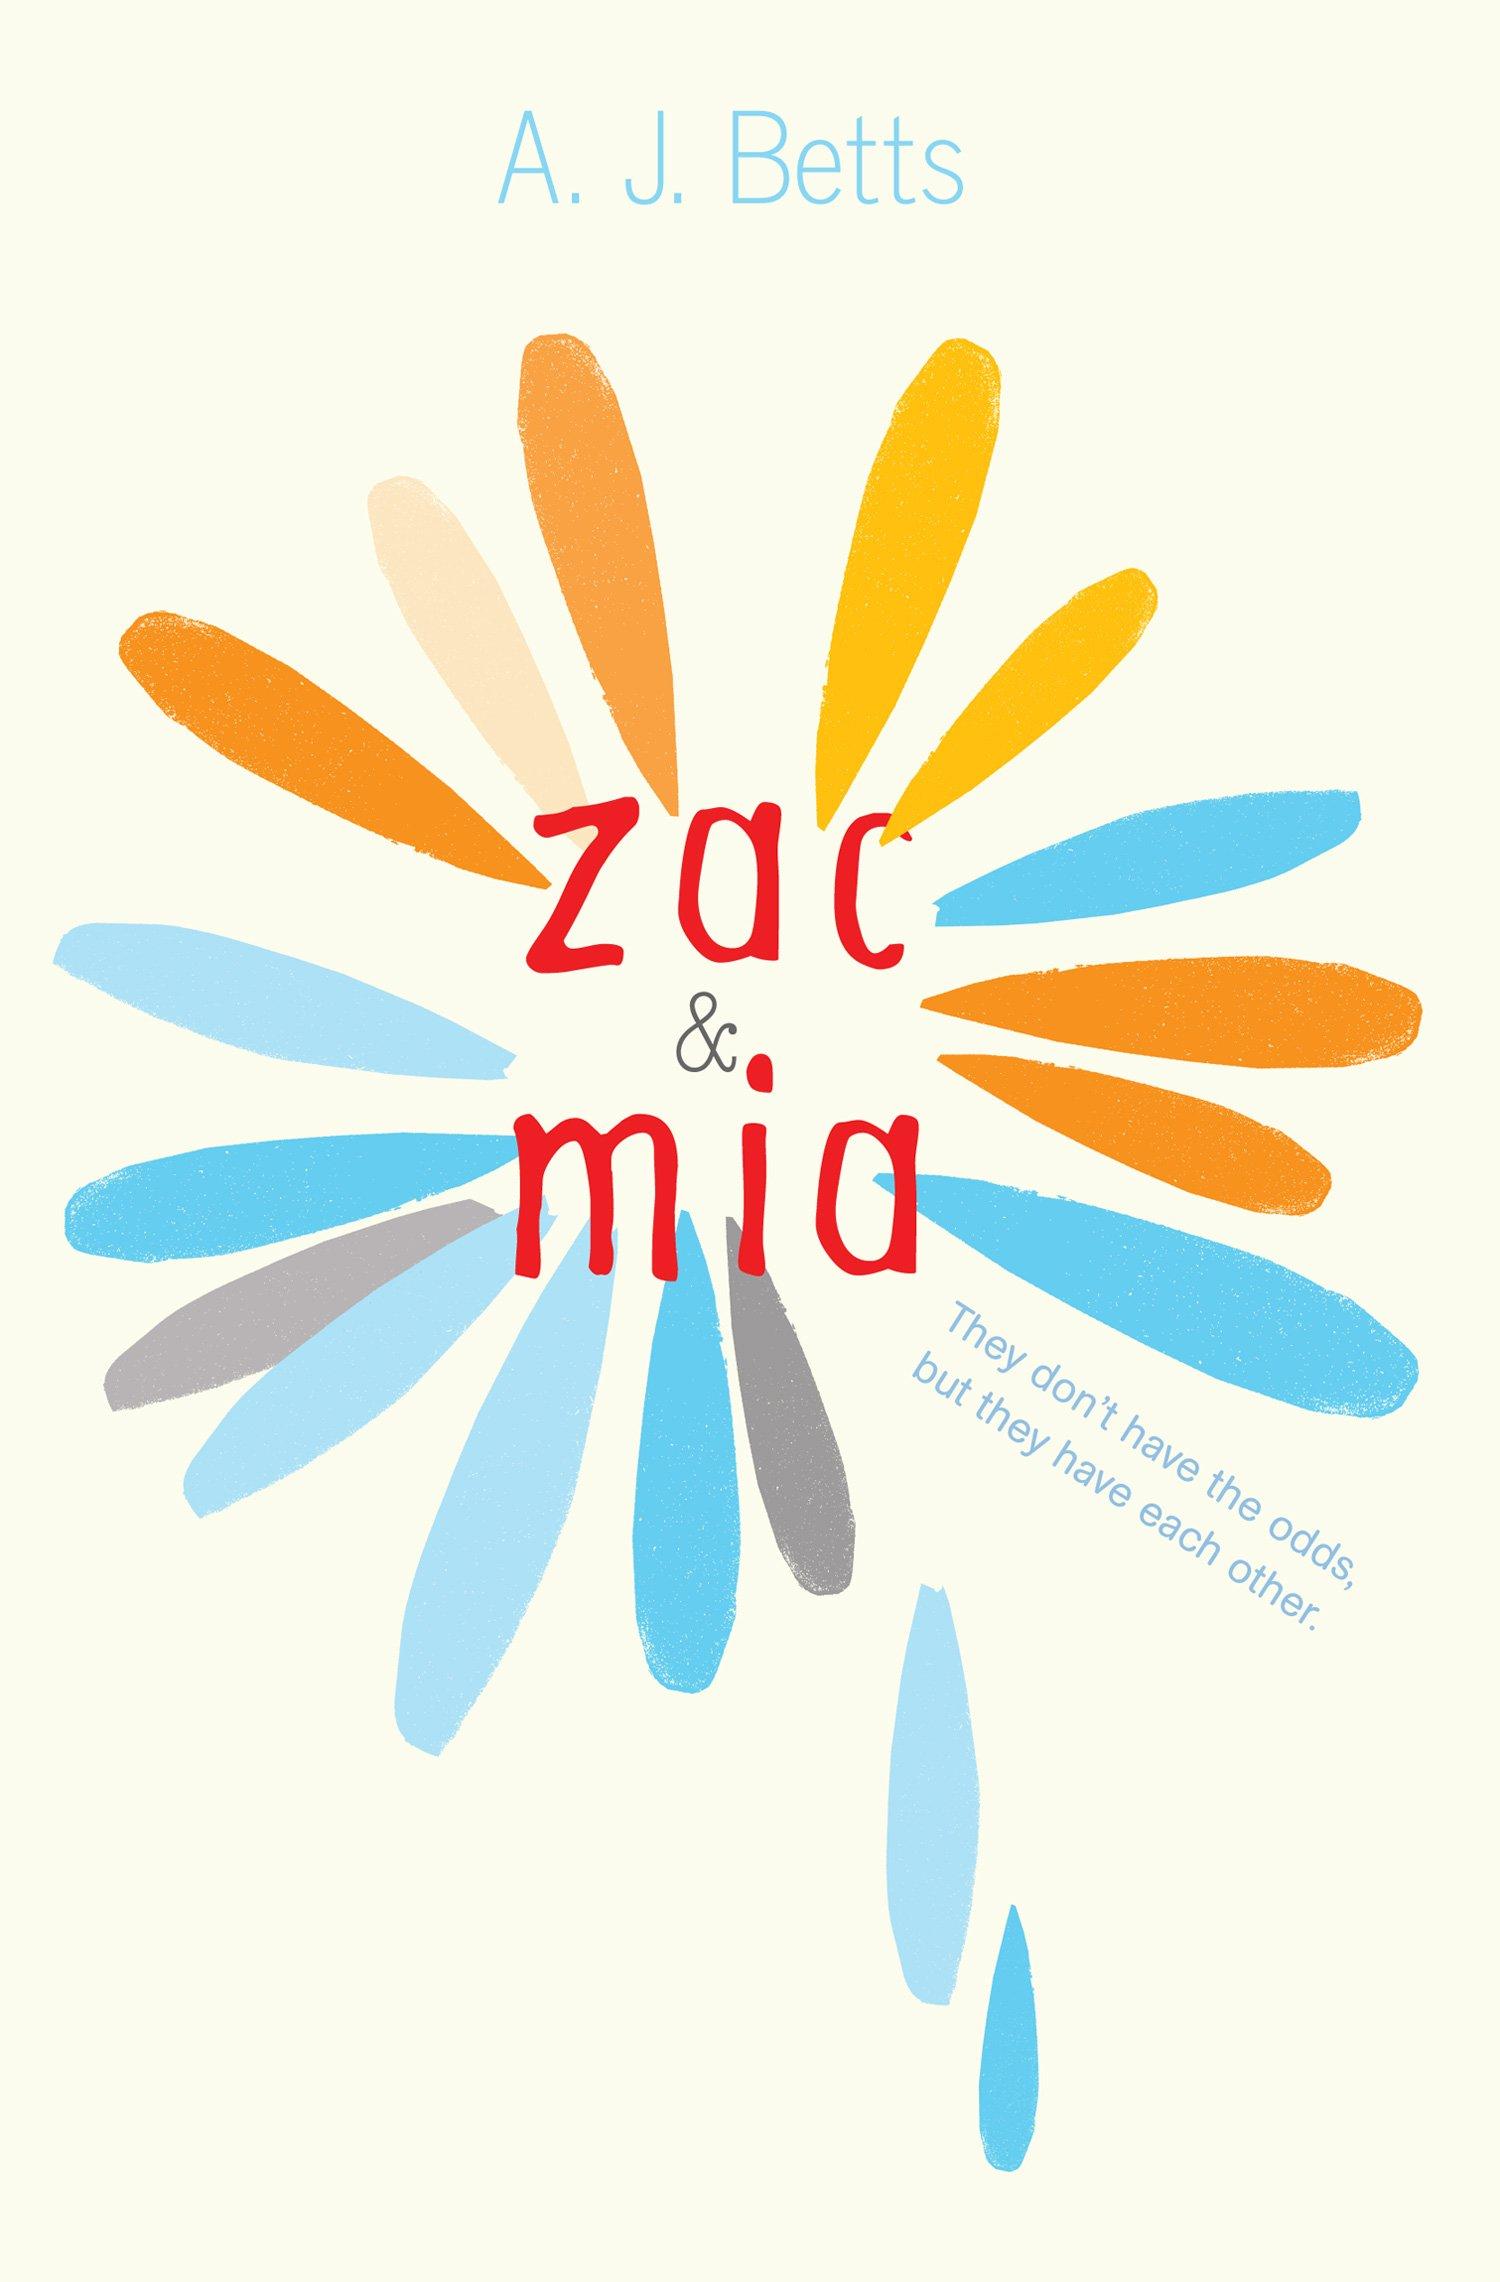 Zac & Mia by A.J. Betts (Sept. 2014)  Amazon  |  Goodreads